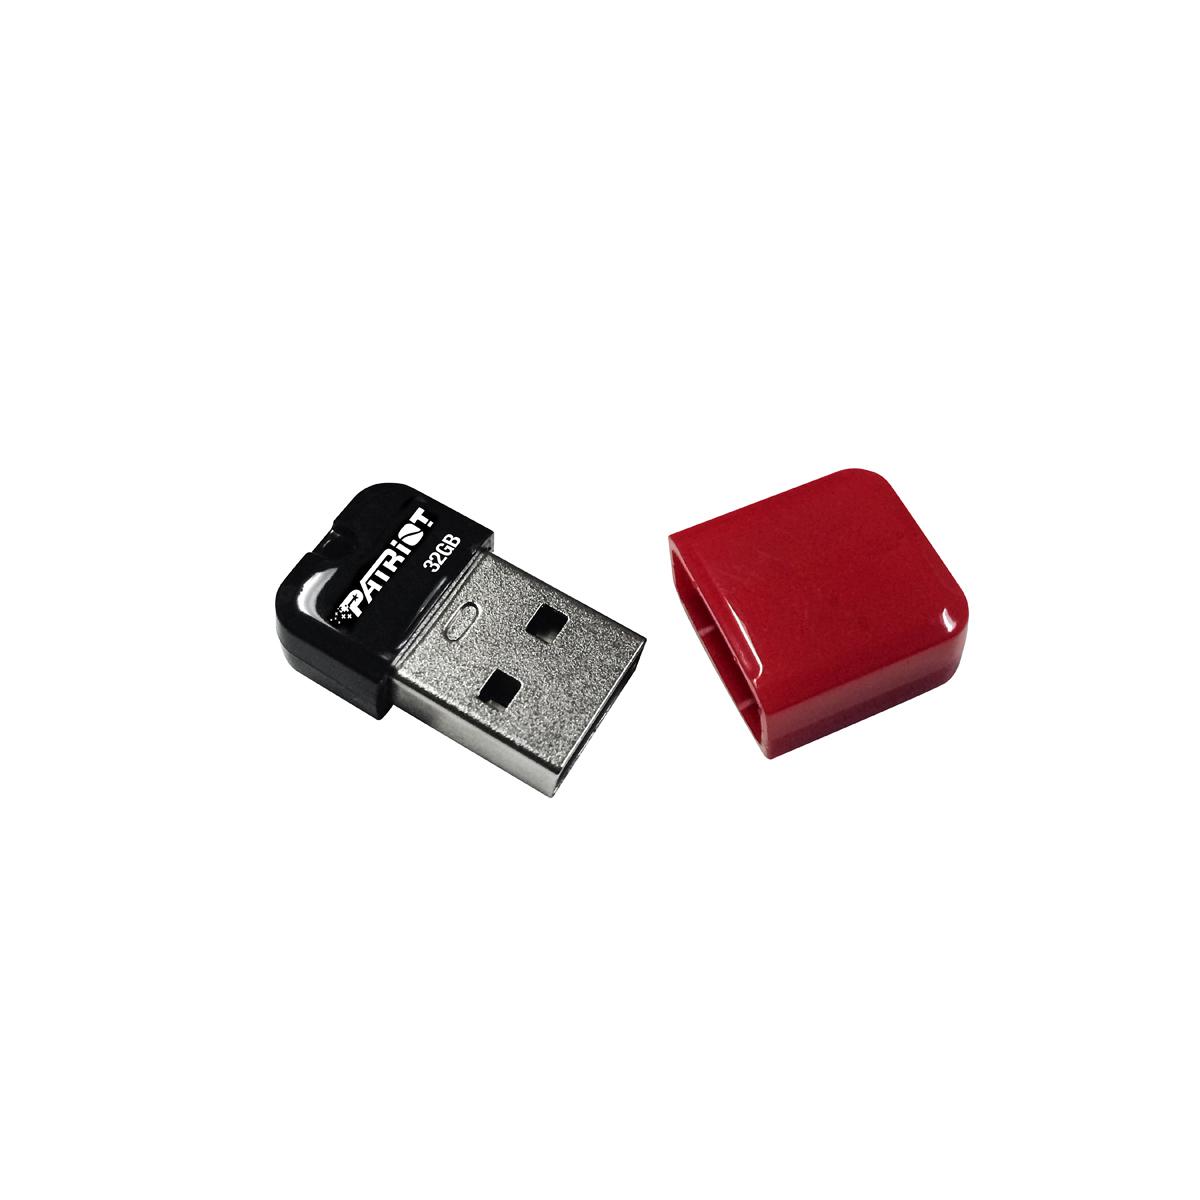 32GB Patriot Xporter Jibe USB 2.0 max. 20MB/s